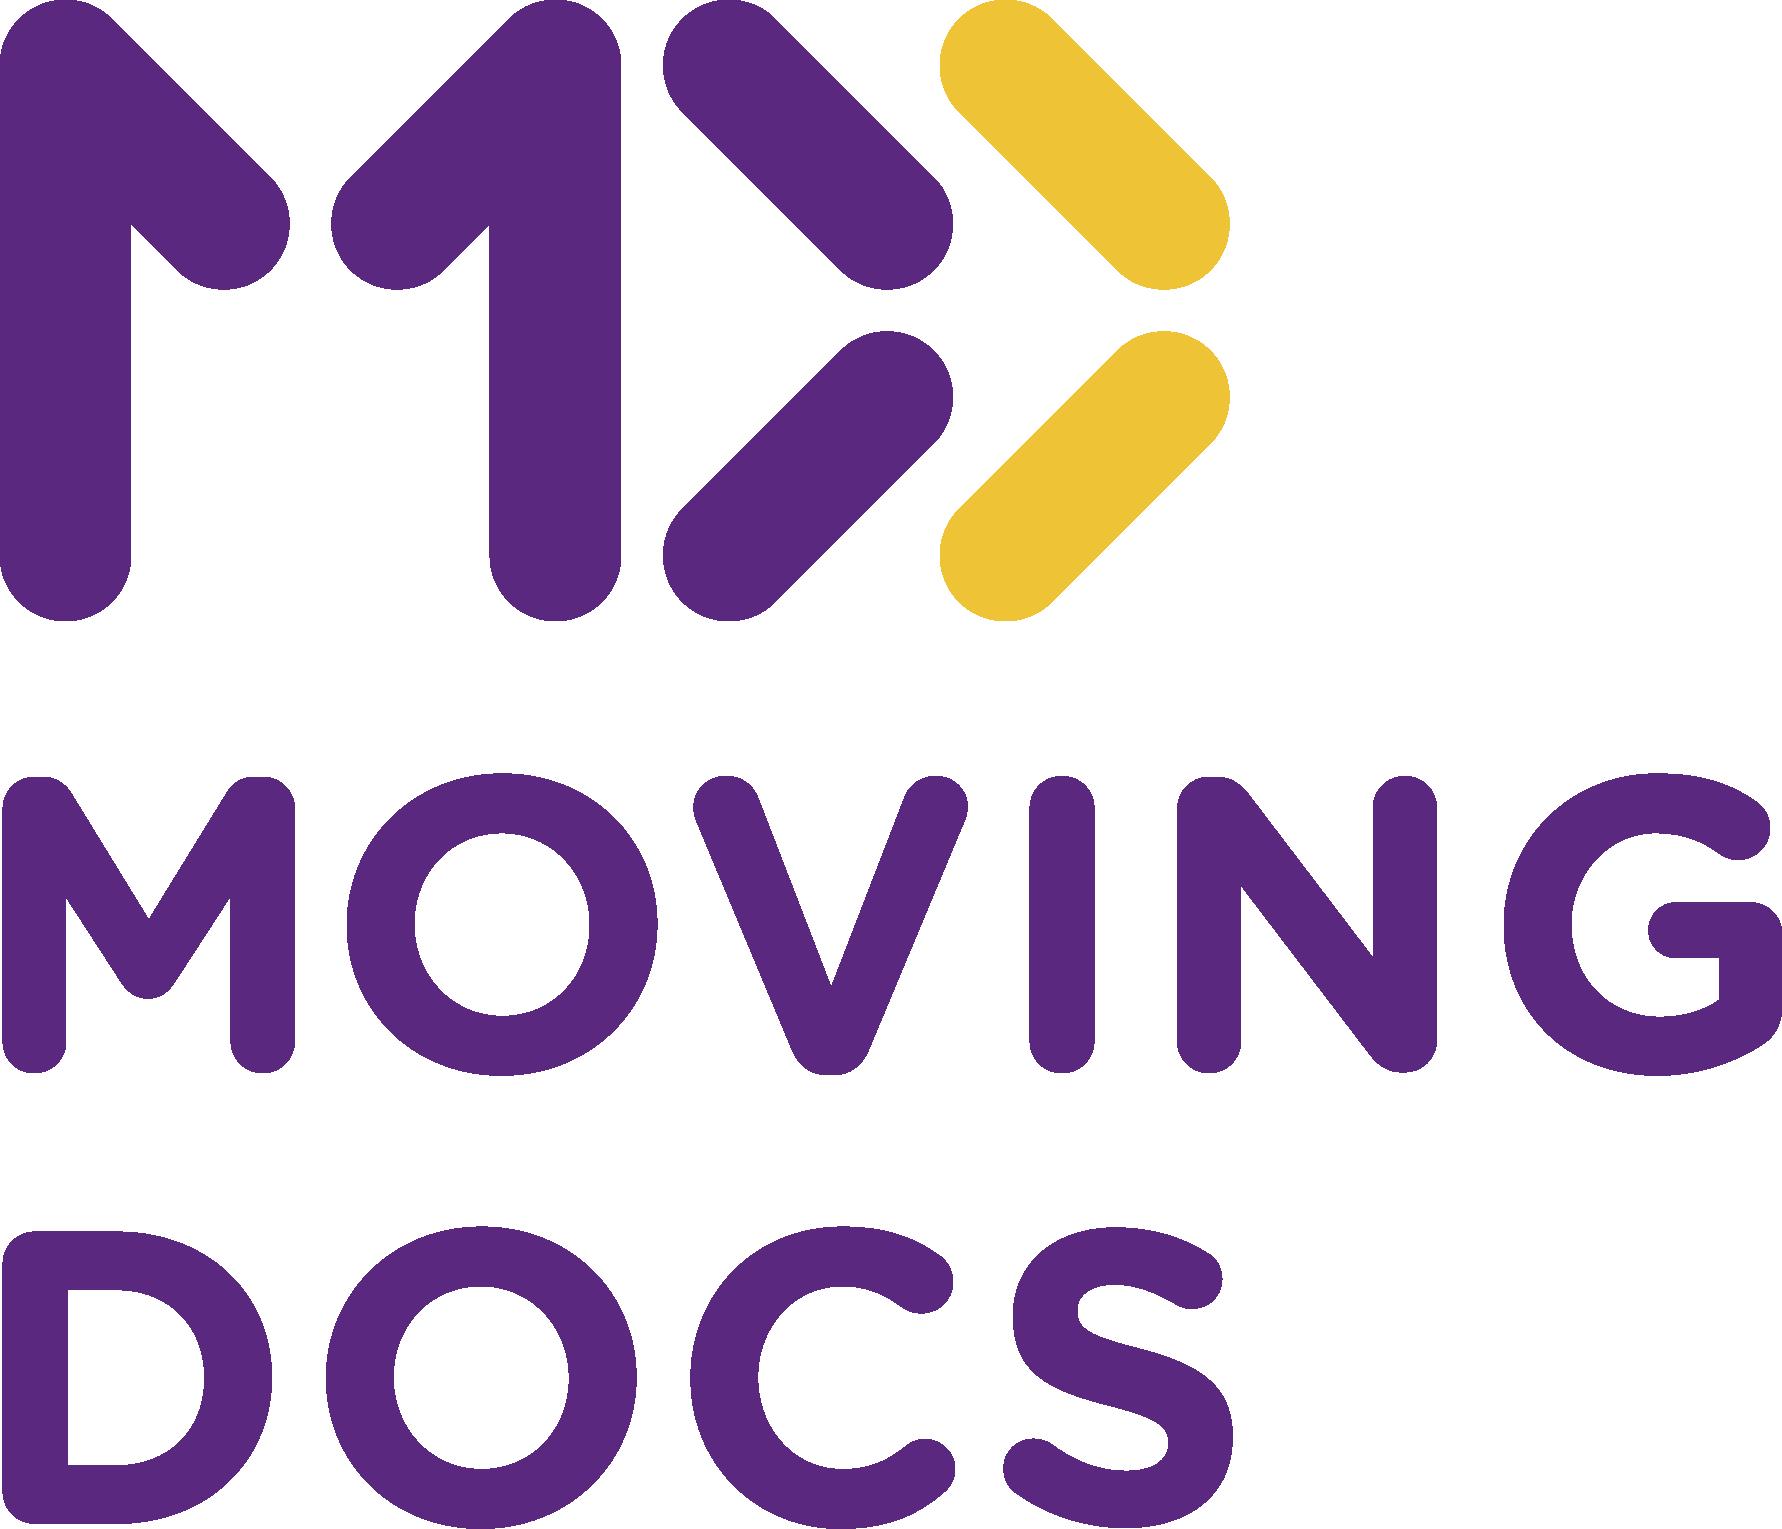 moving_docs-01.png